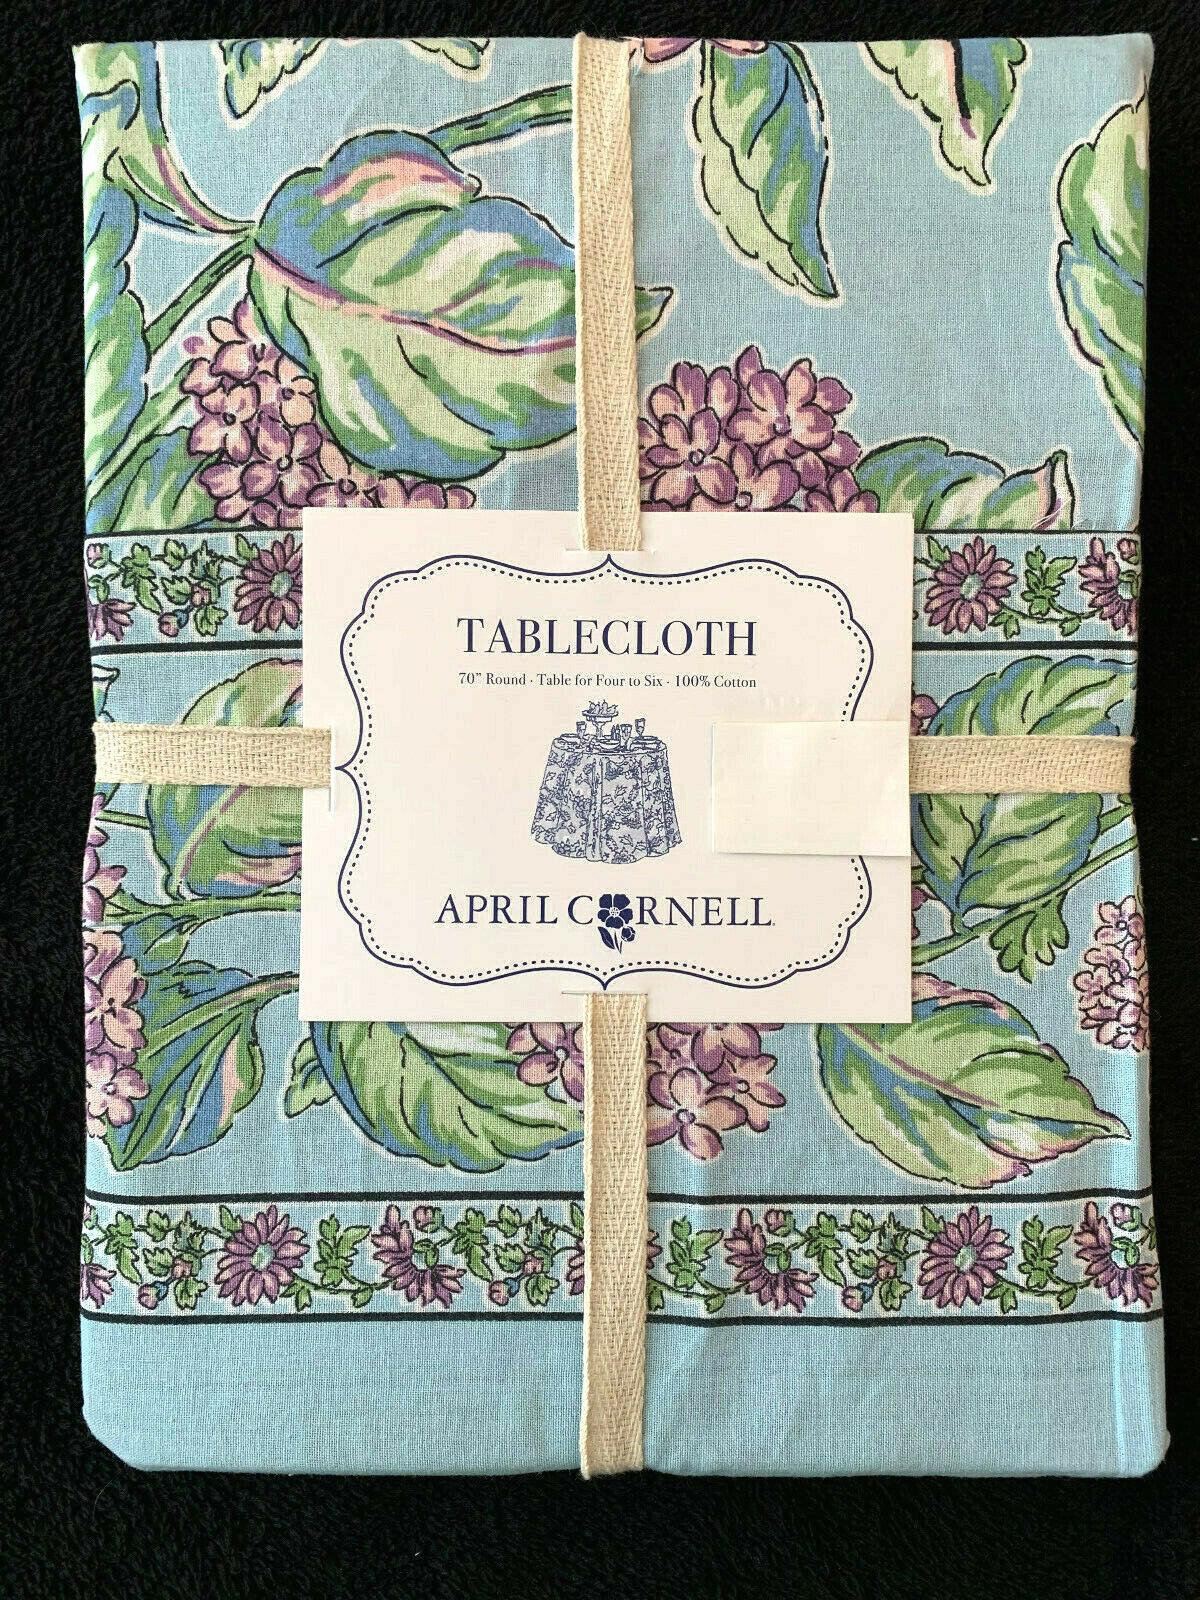 APRIL CORNELL - Blau LAVENDER Grün FLORAL PRINT - 70  ROUND TABLECLOTH - NEW